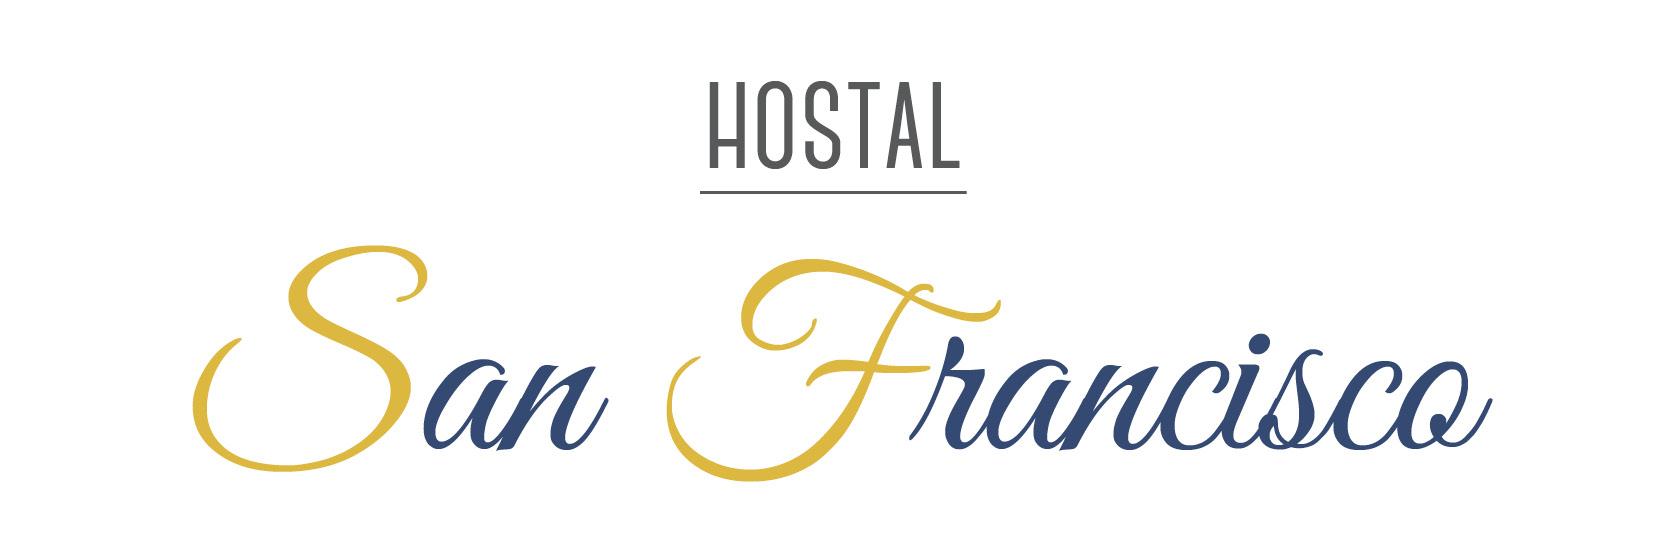 hostalgranjadetorrehermosa.com